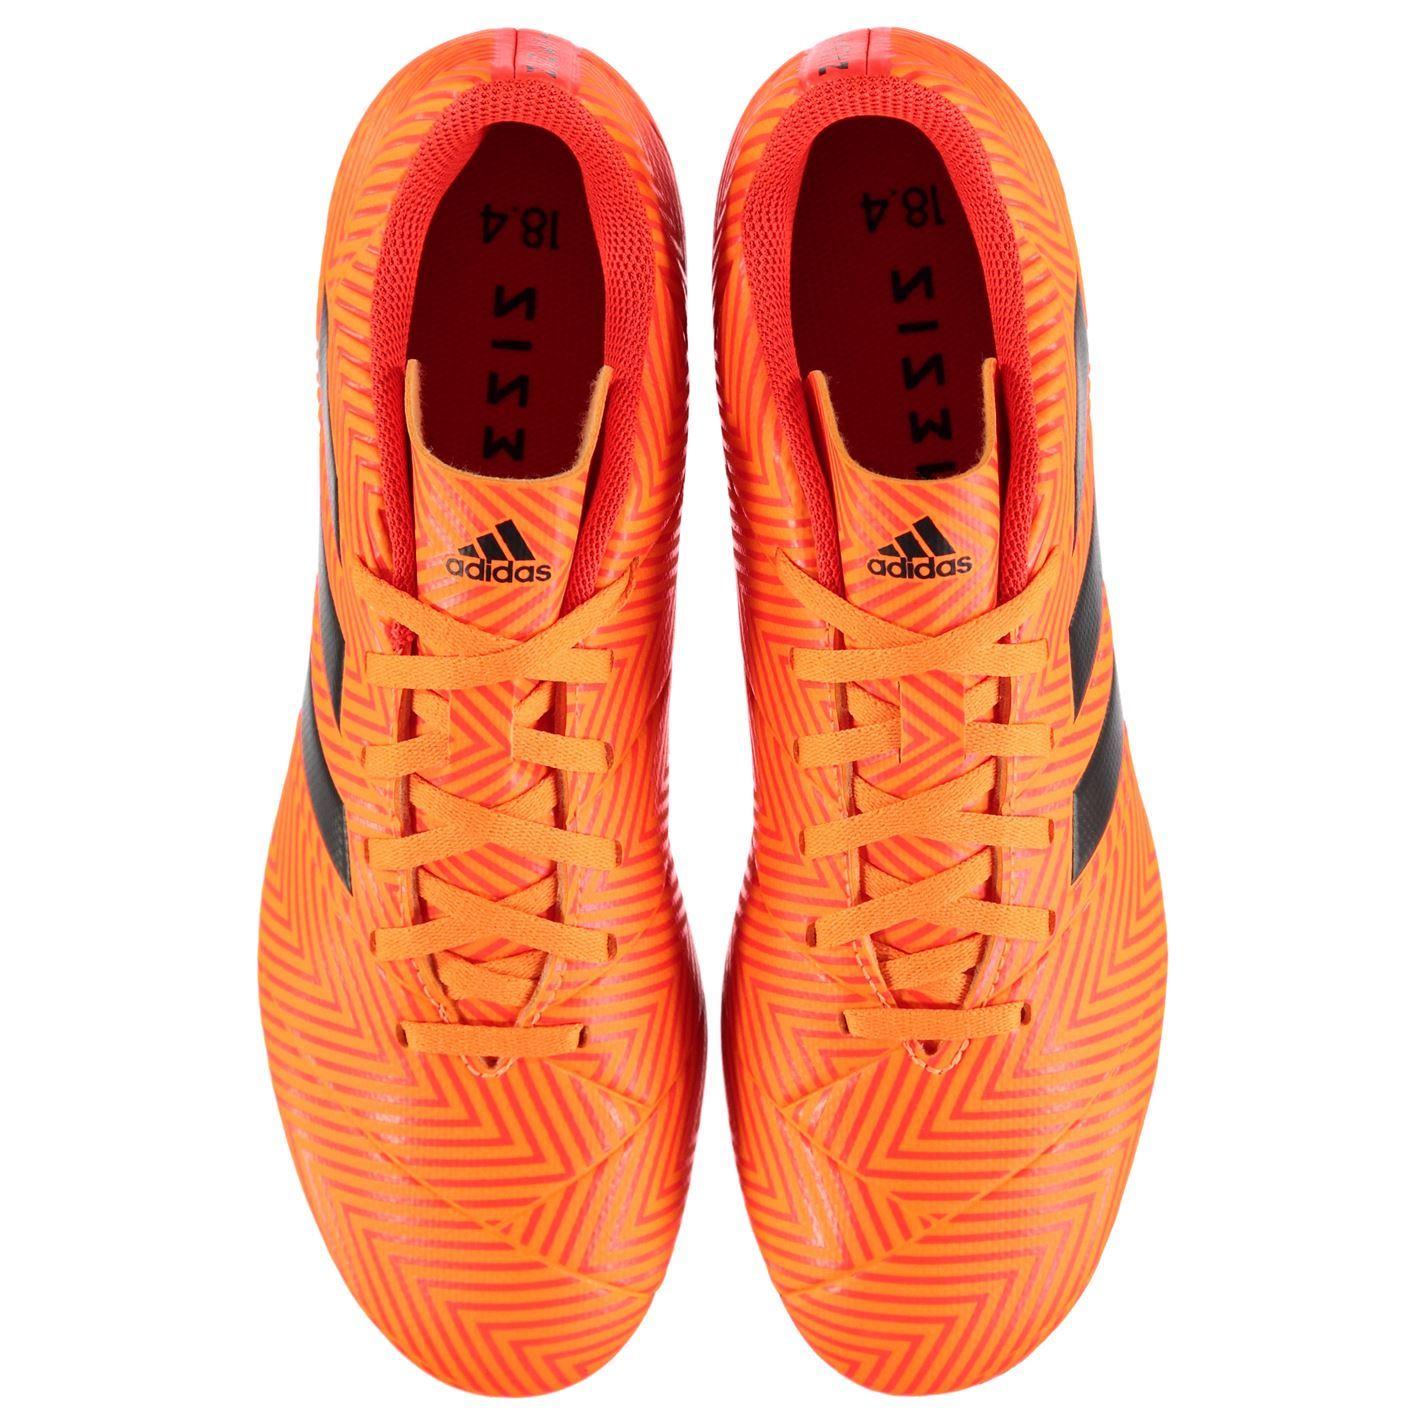 fe16e1591772 ... adidas Nemeziz 18.4 Firm Ground Football Boots Mens Orange Soccer Shoes  Cleats